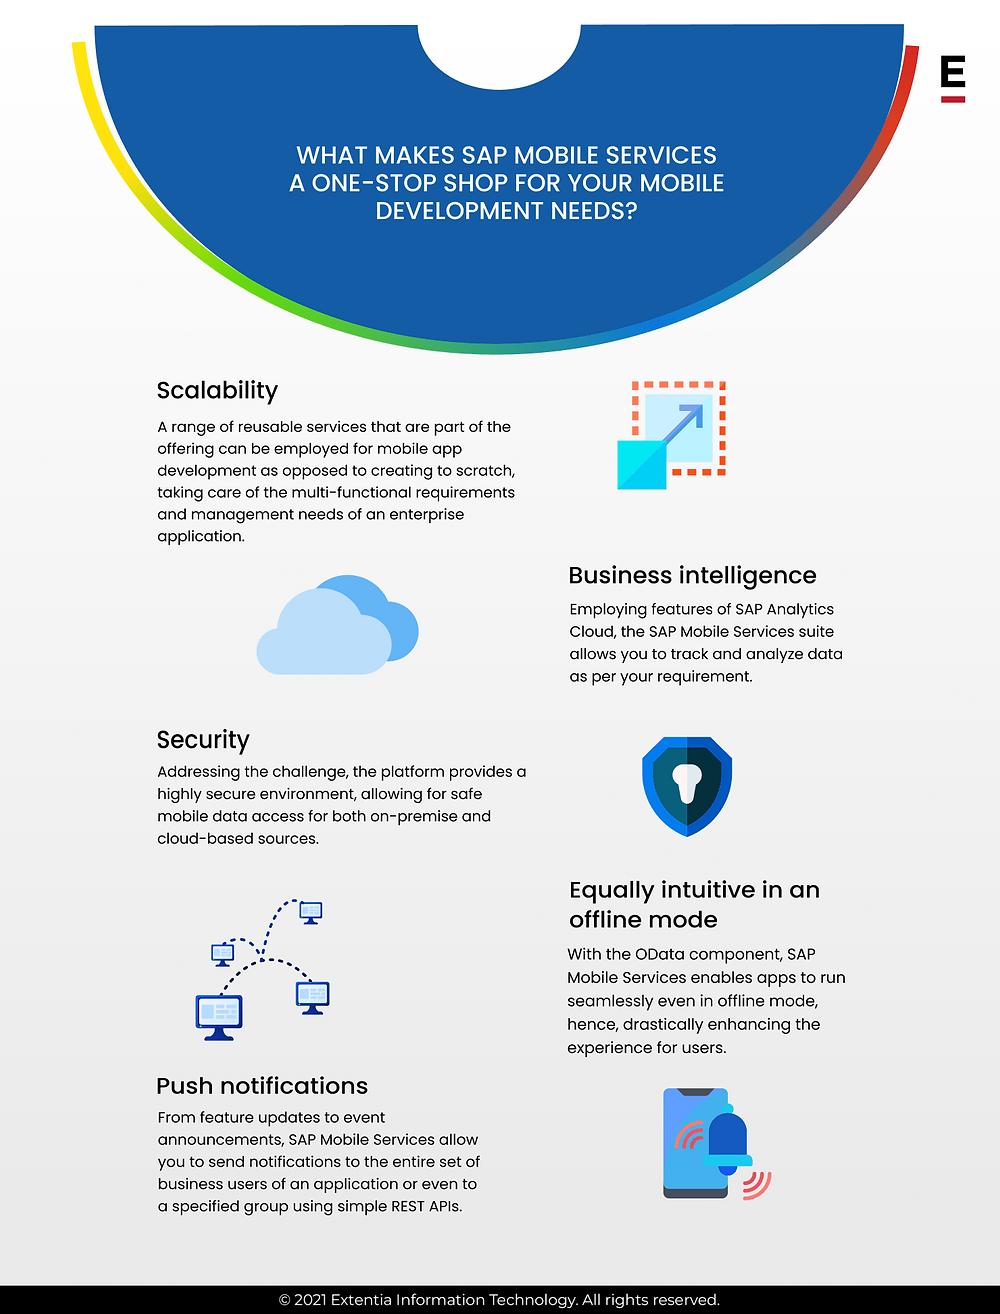 SAP Mobile Development Services